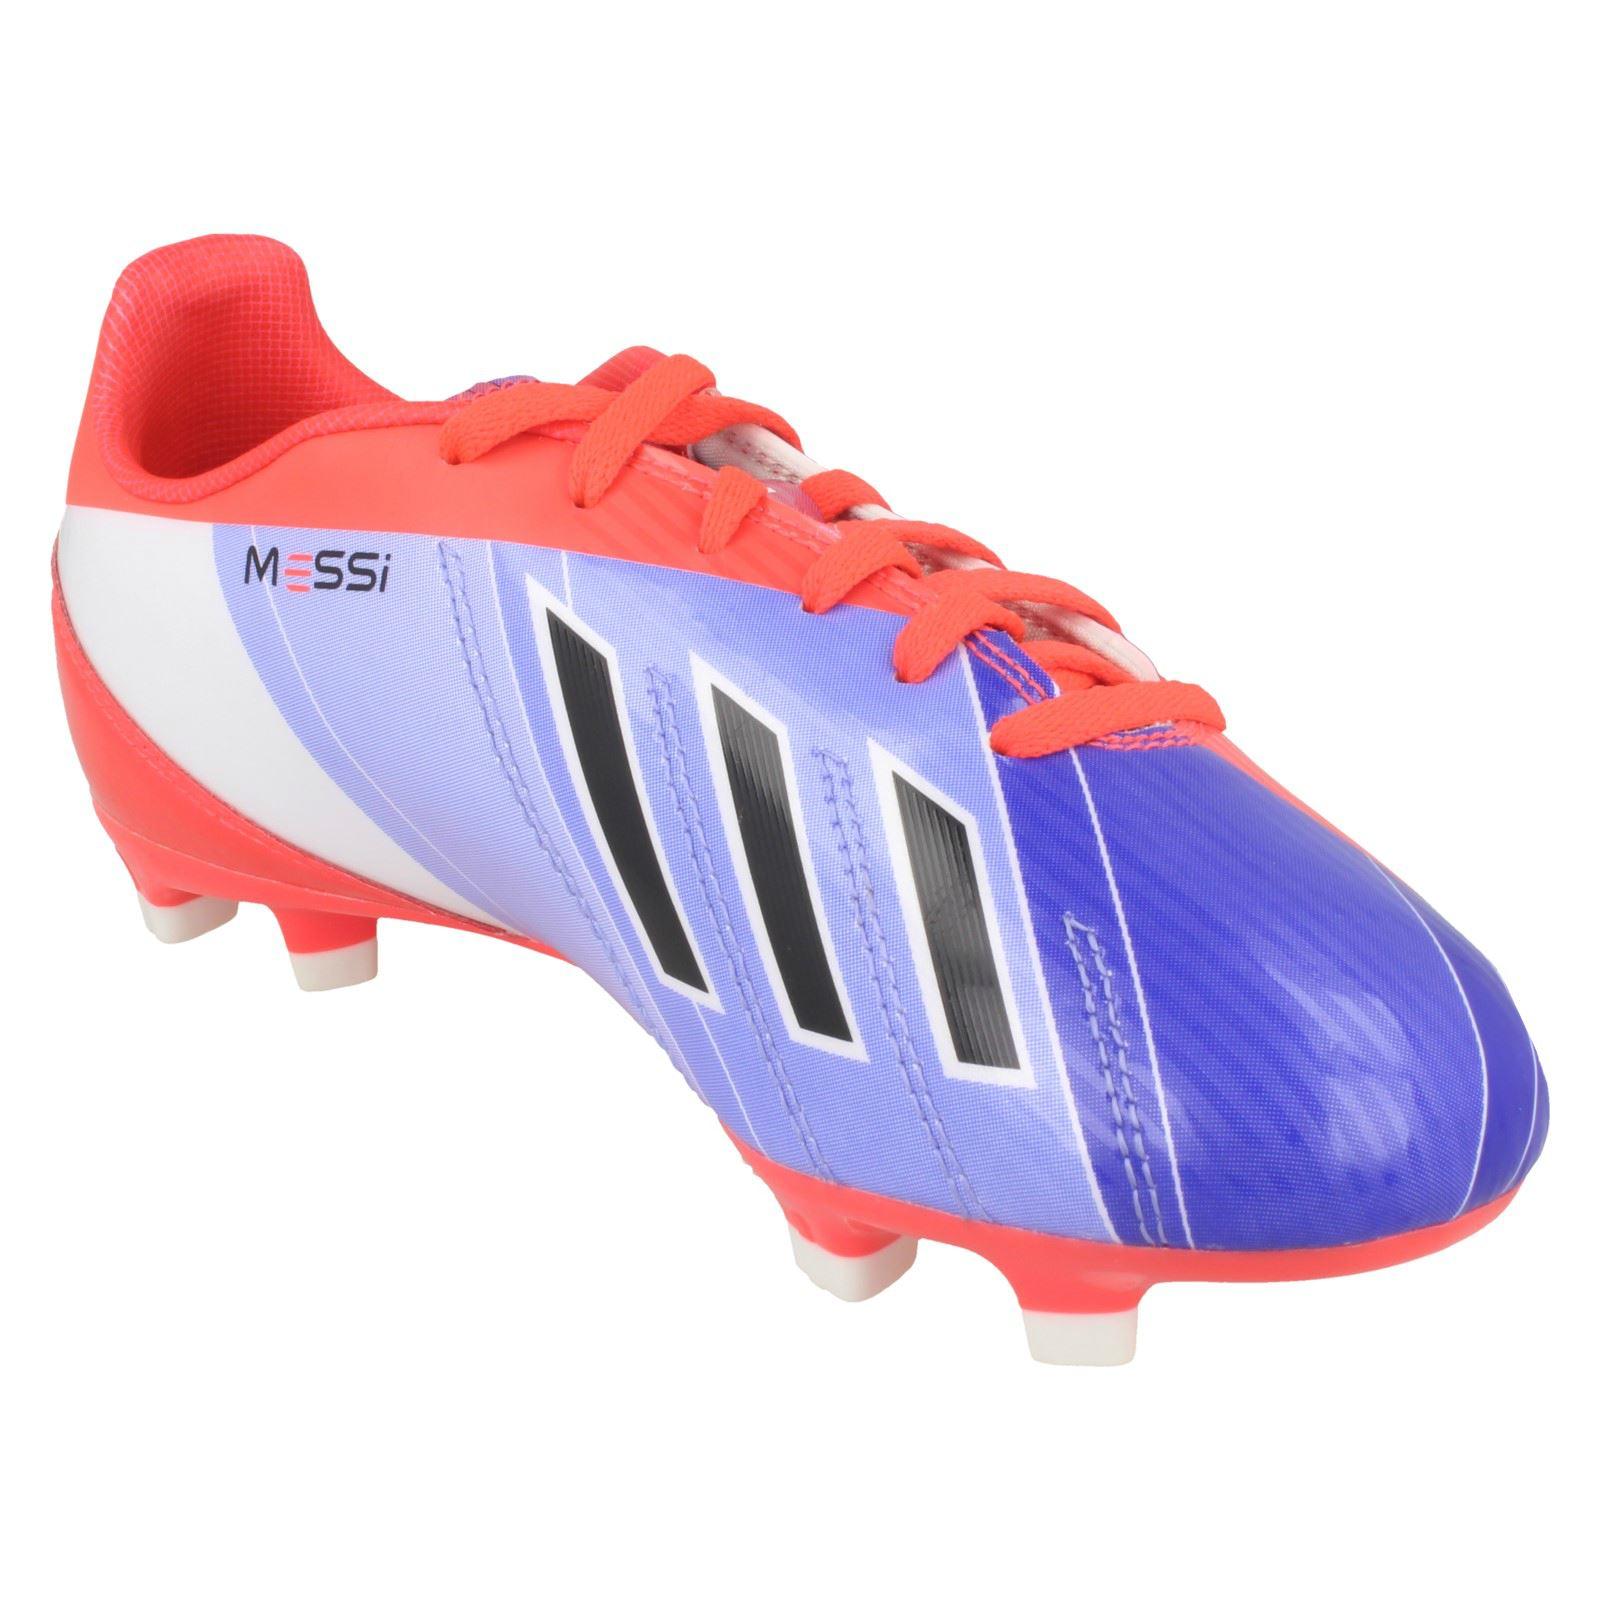 adidas F5 TRX TF Men s Astroturf Football BOOTS Soccer Shoes Messi ... 0311f29f0e96a